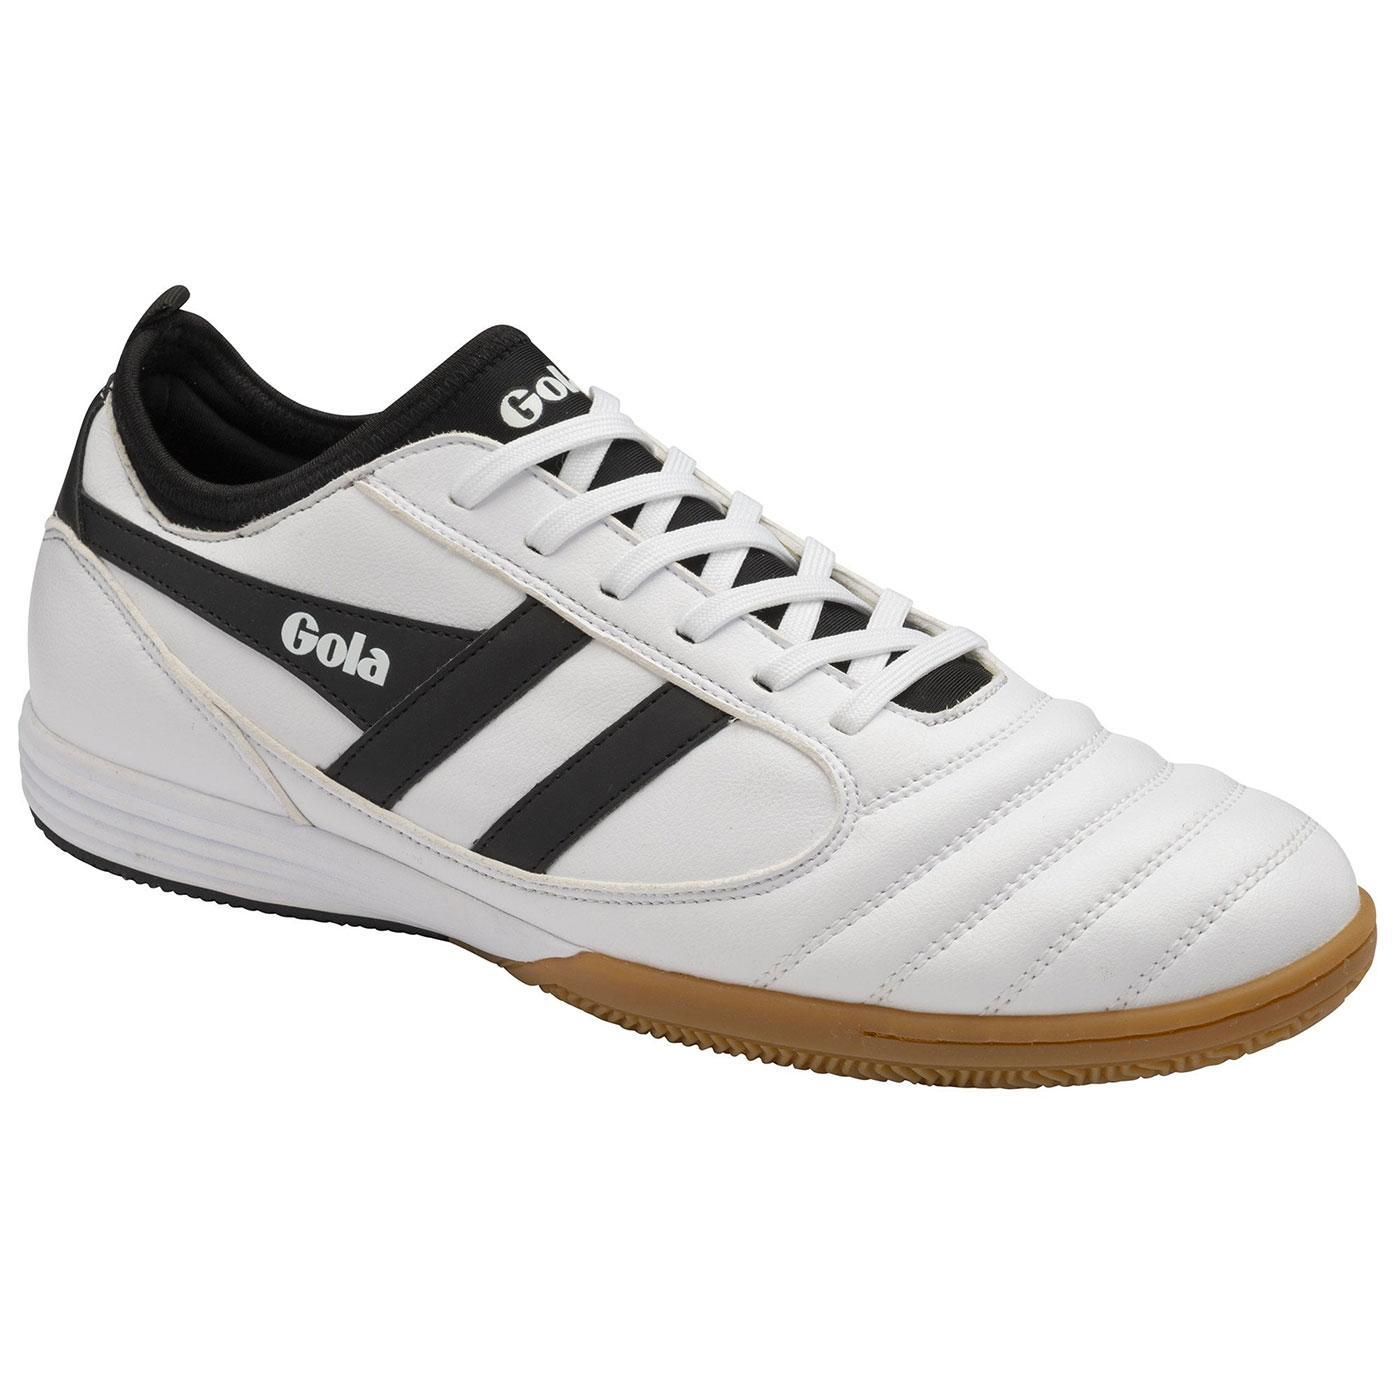 Ceptor TX GOLA Performance Retro Trainers (White)